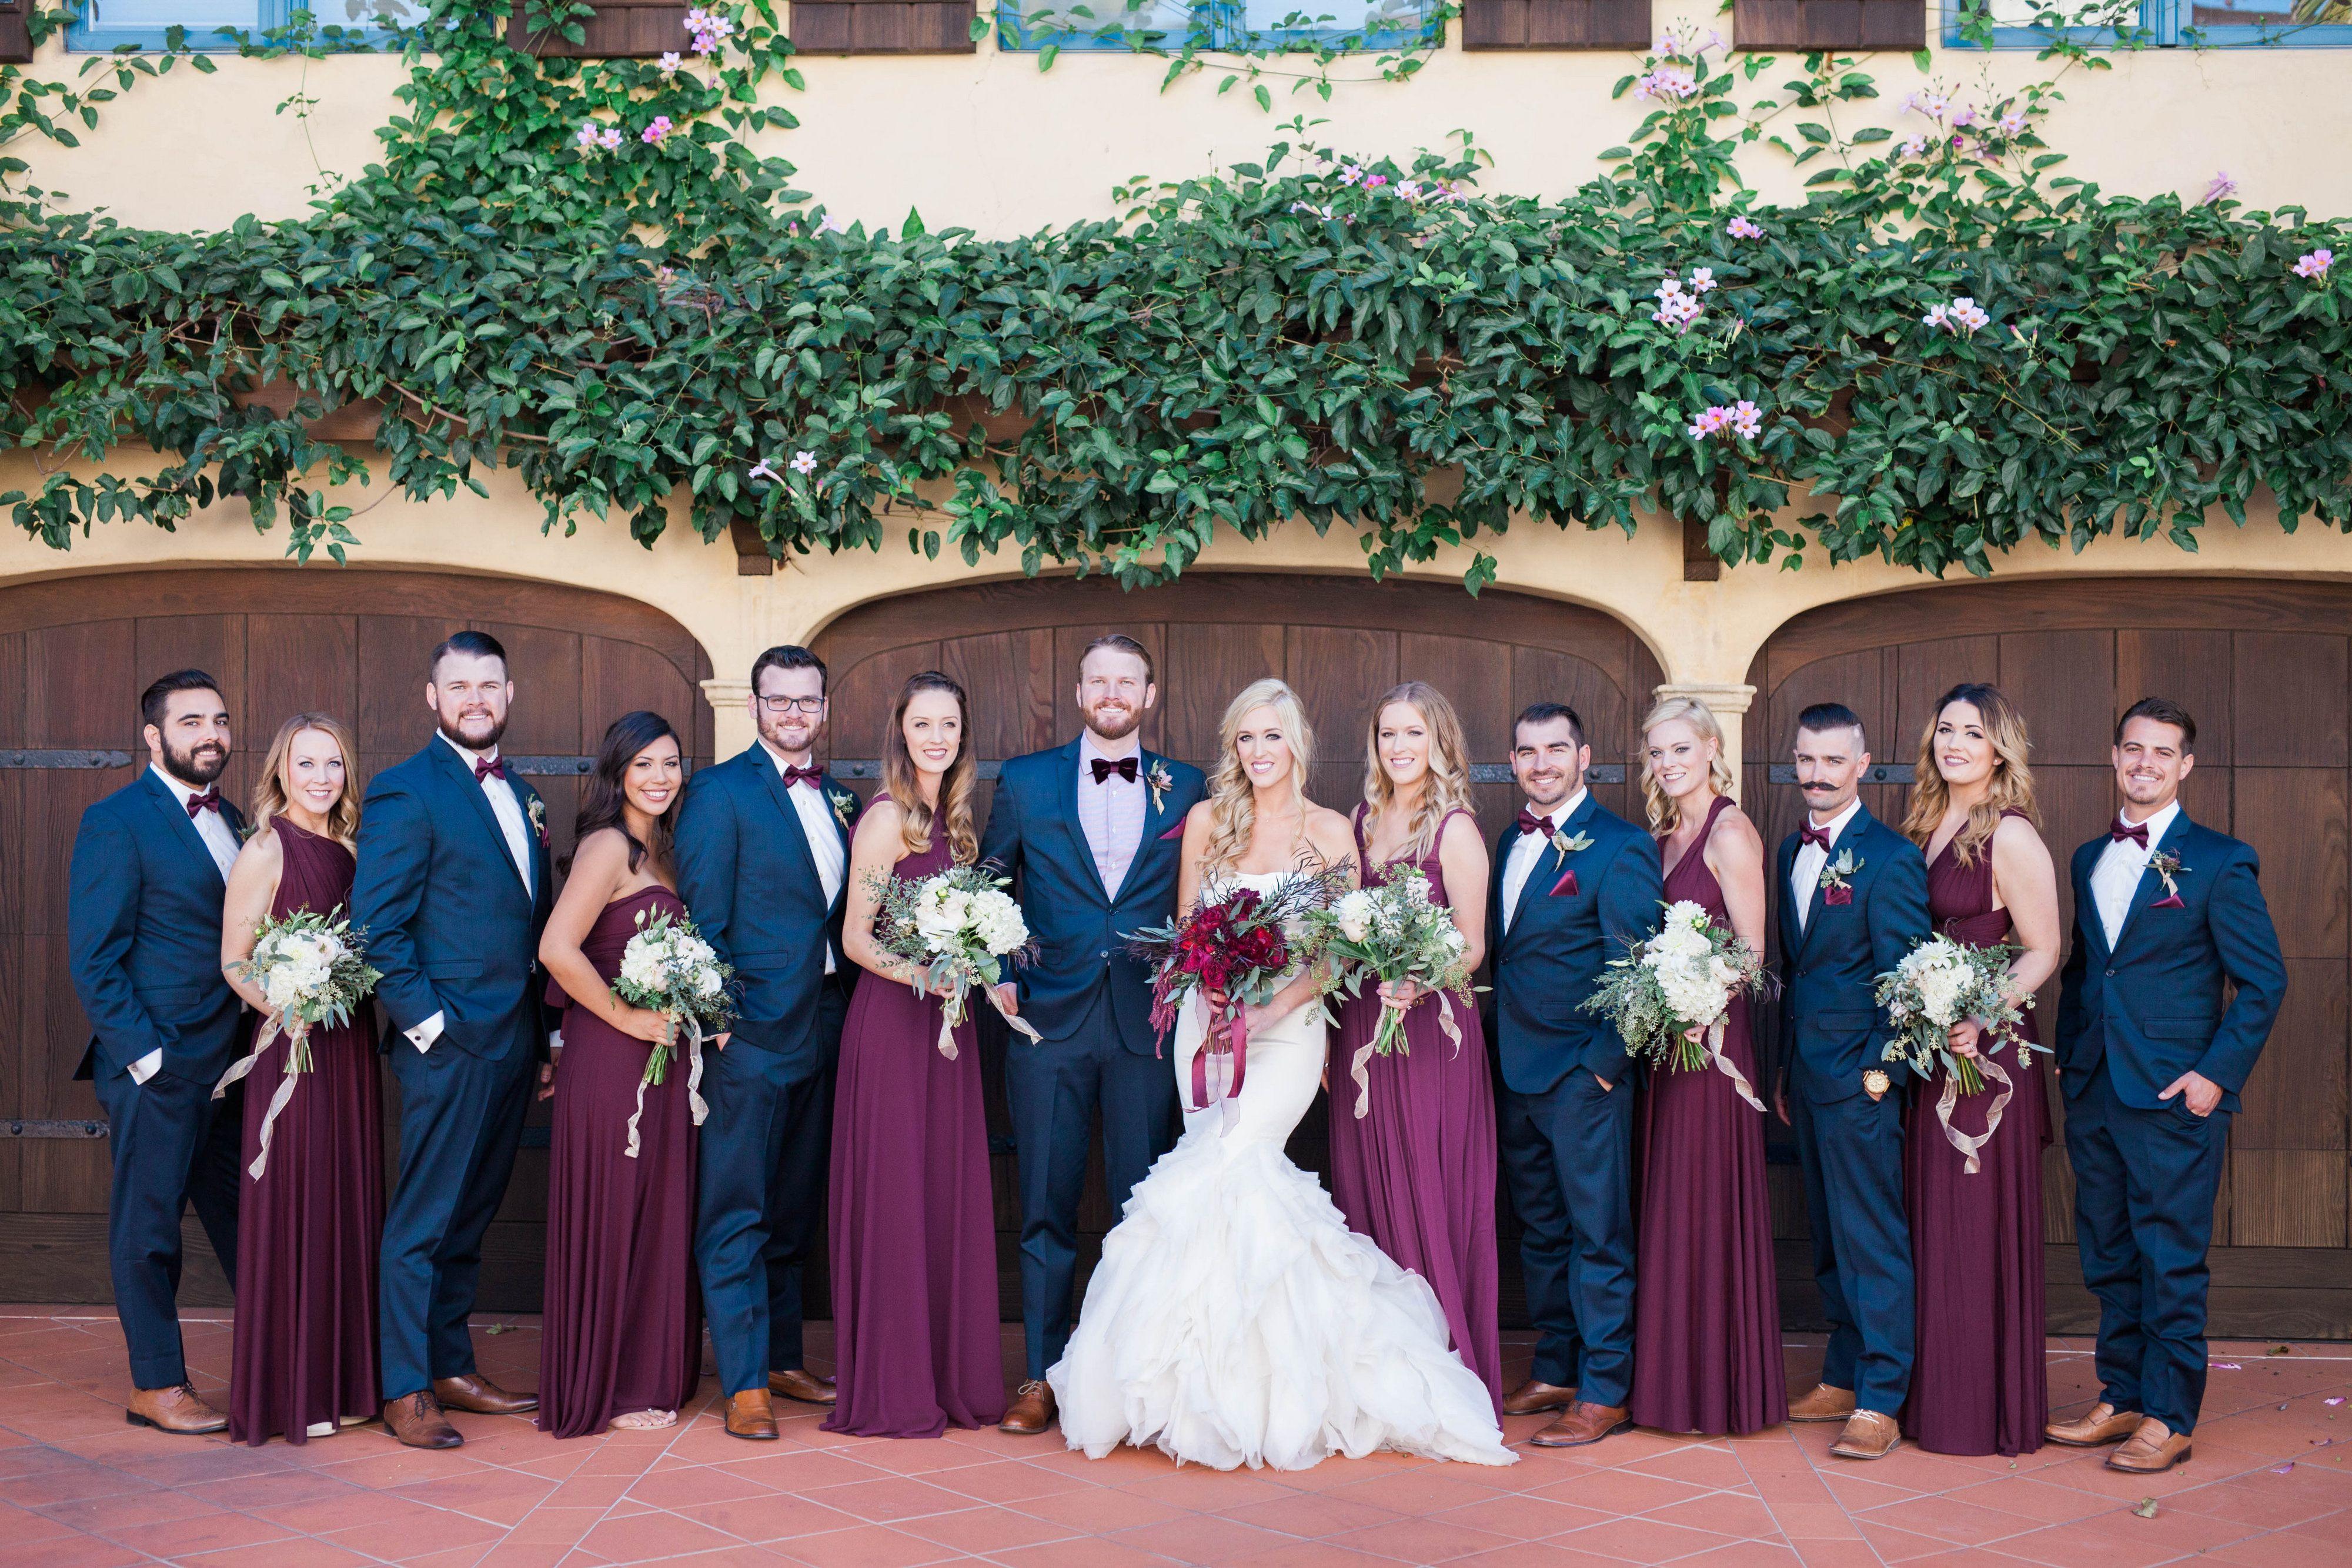 Winter garden wedding with shades of marsala, berry